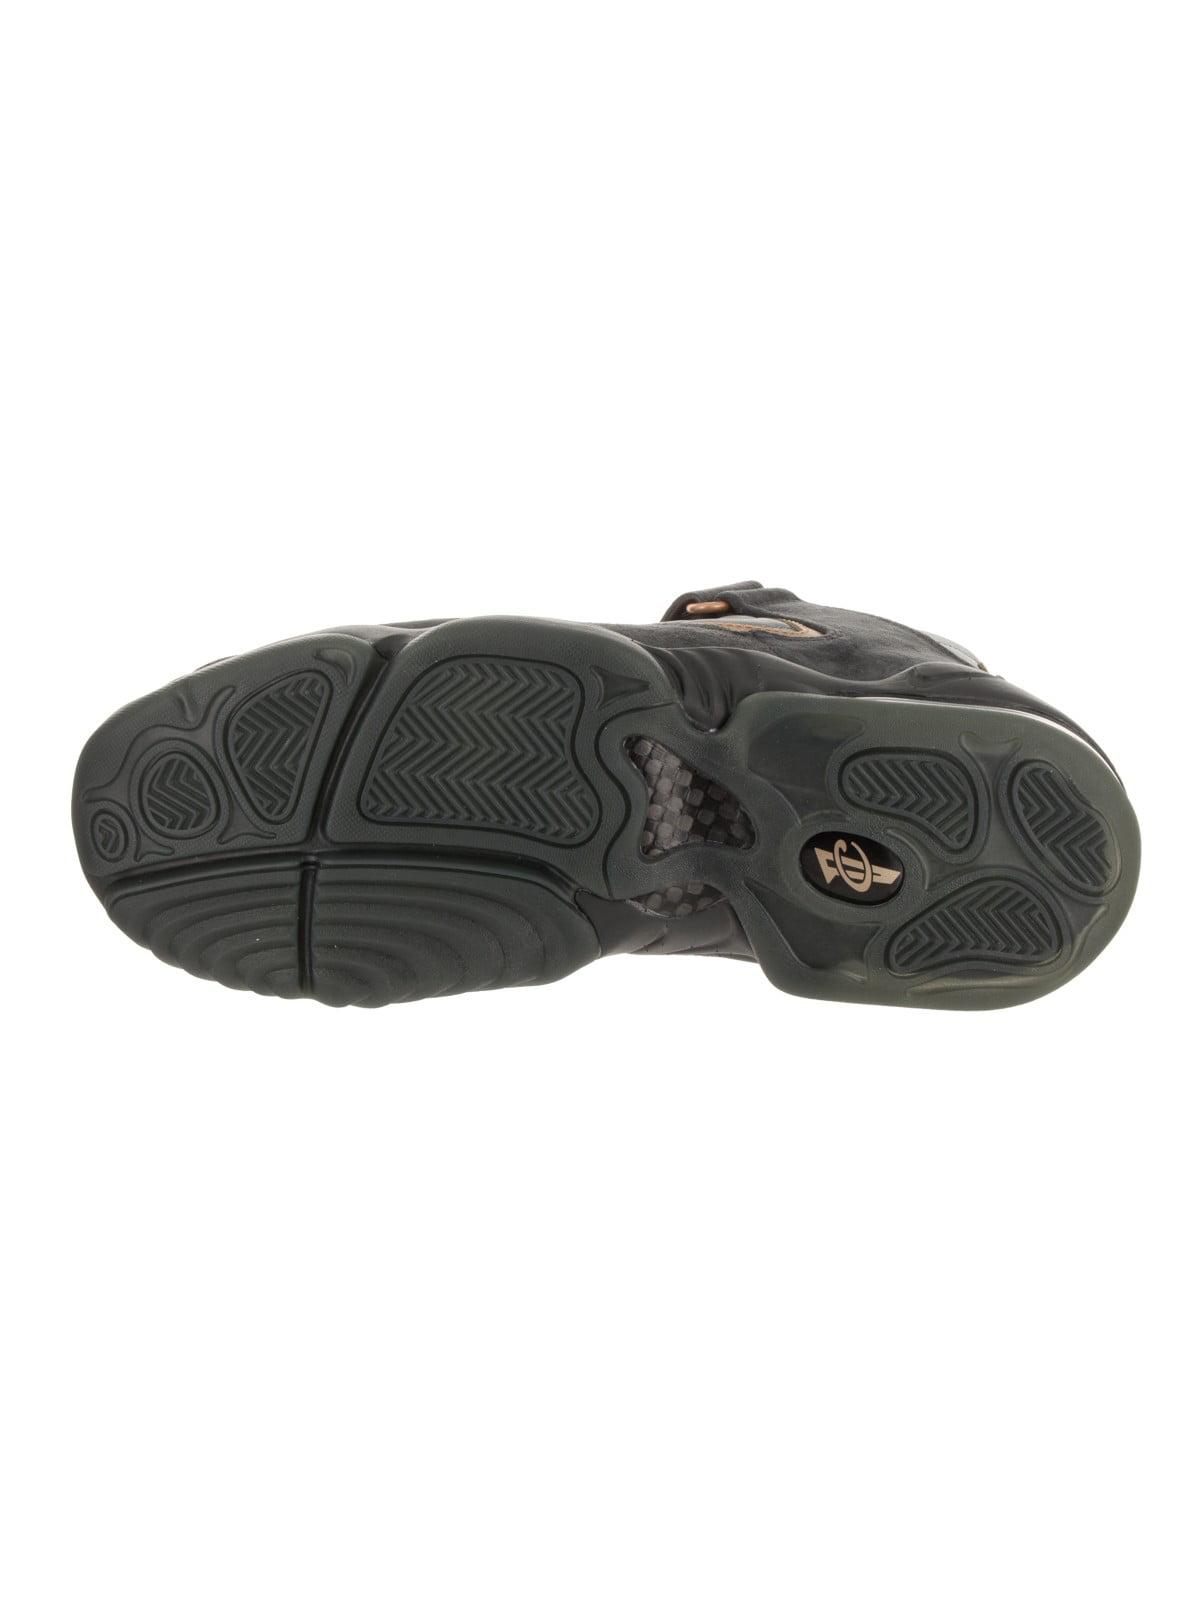 Nike Men's Air Penny IV Basketball Shoe